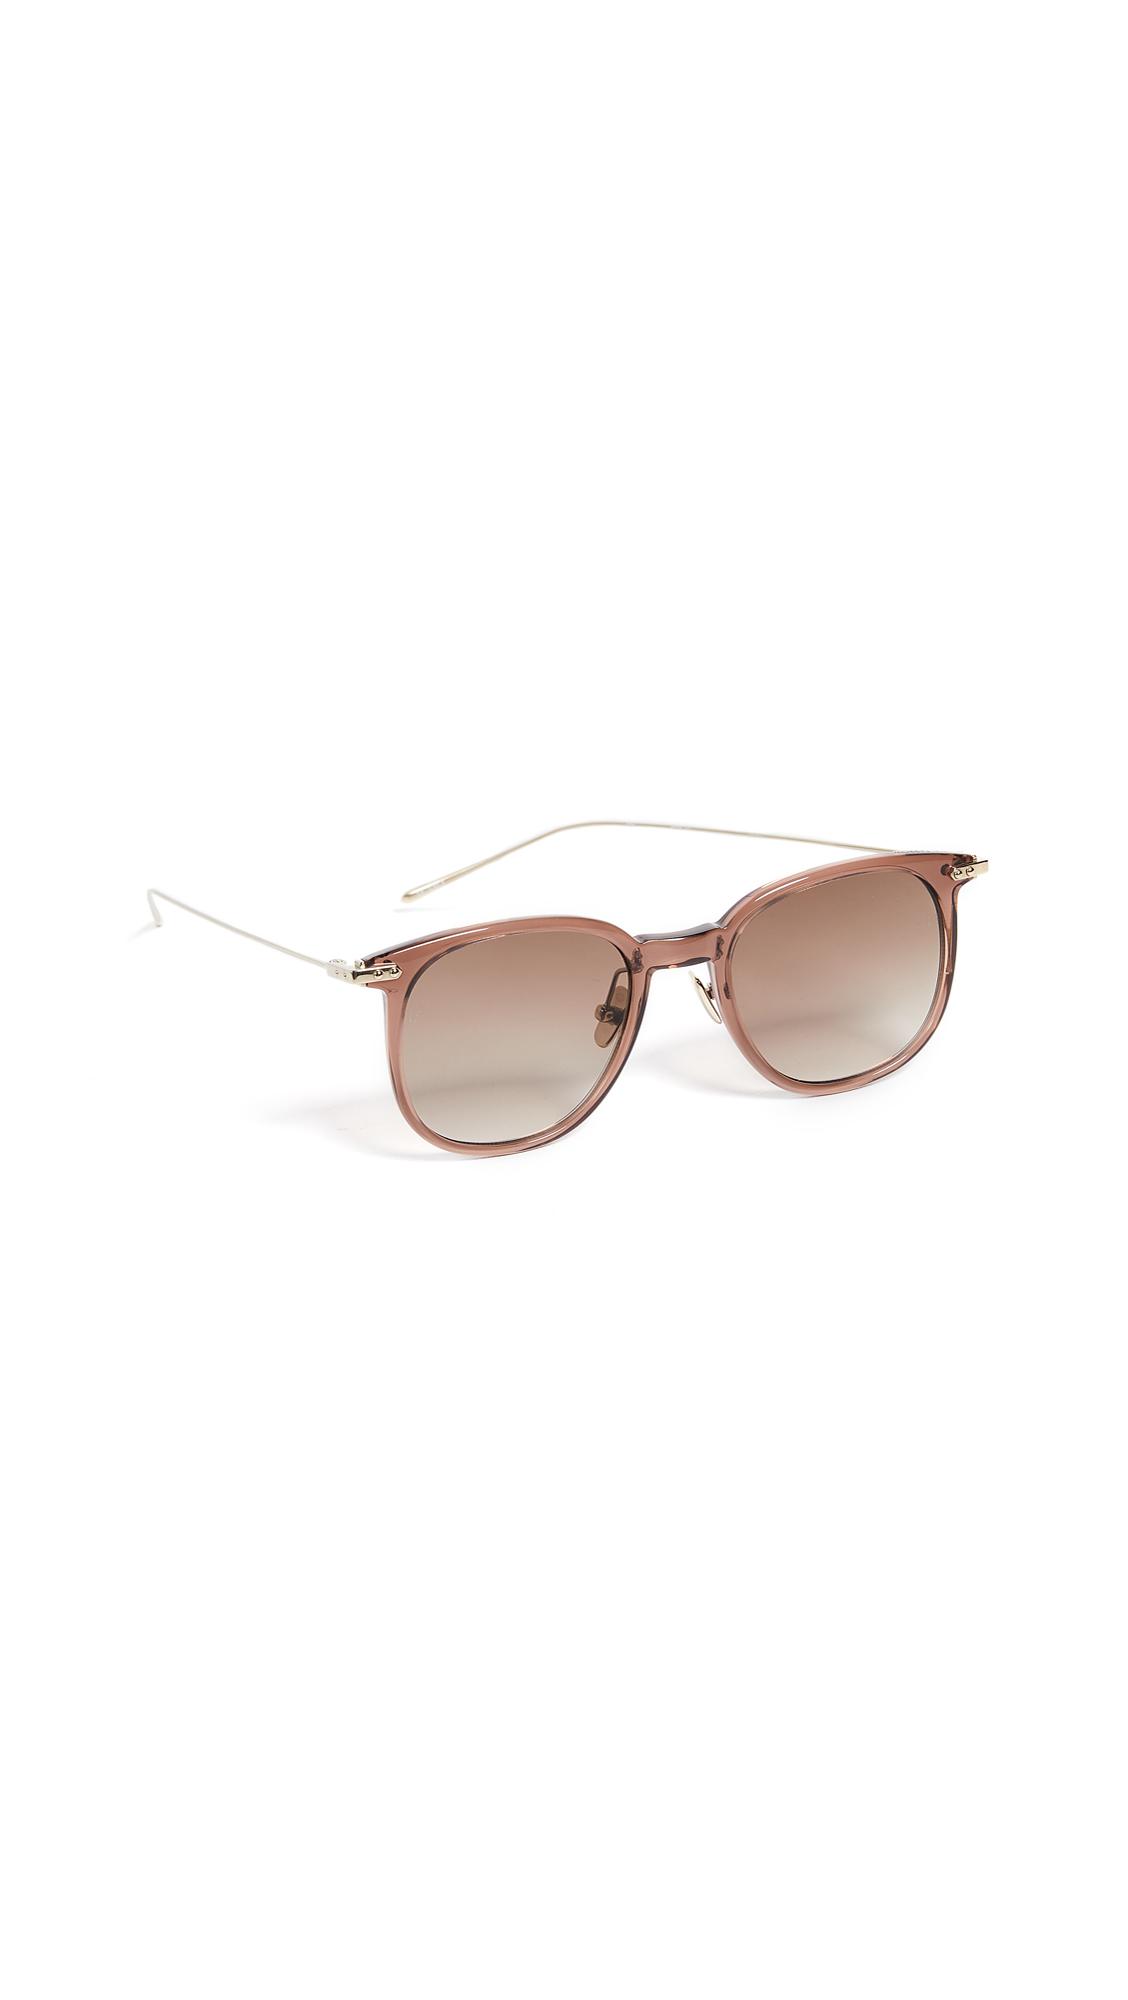 LINDA FARROW LUXE Linear Oversized Wayfarer Sunglasses in Shell/Luna Gold/Solid Brown